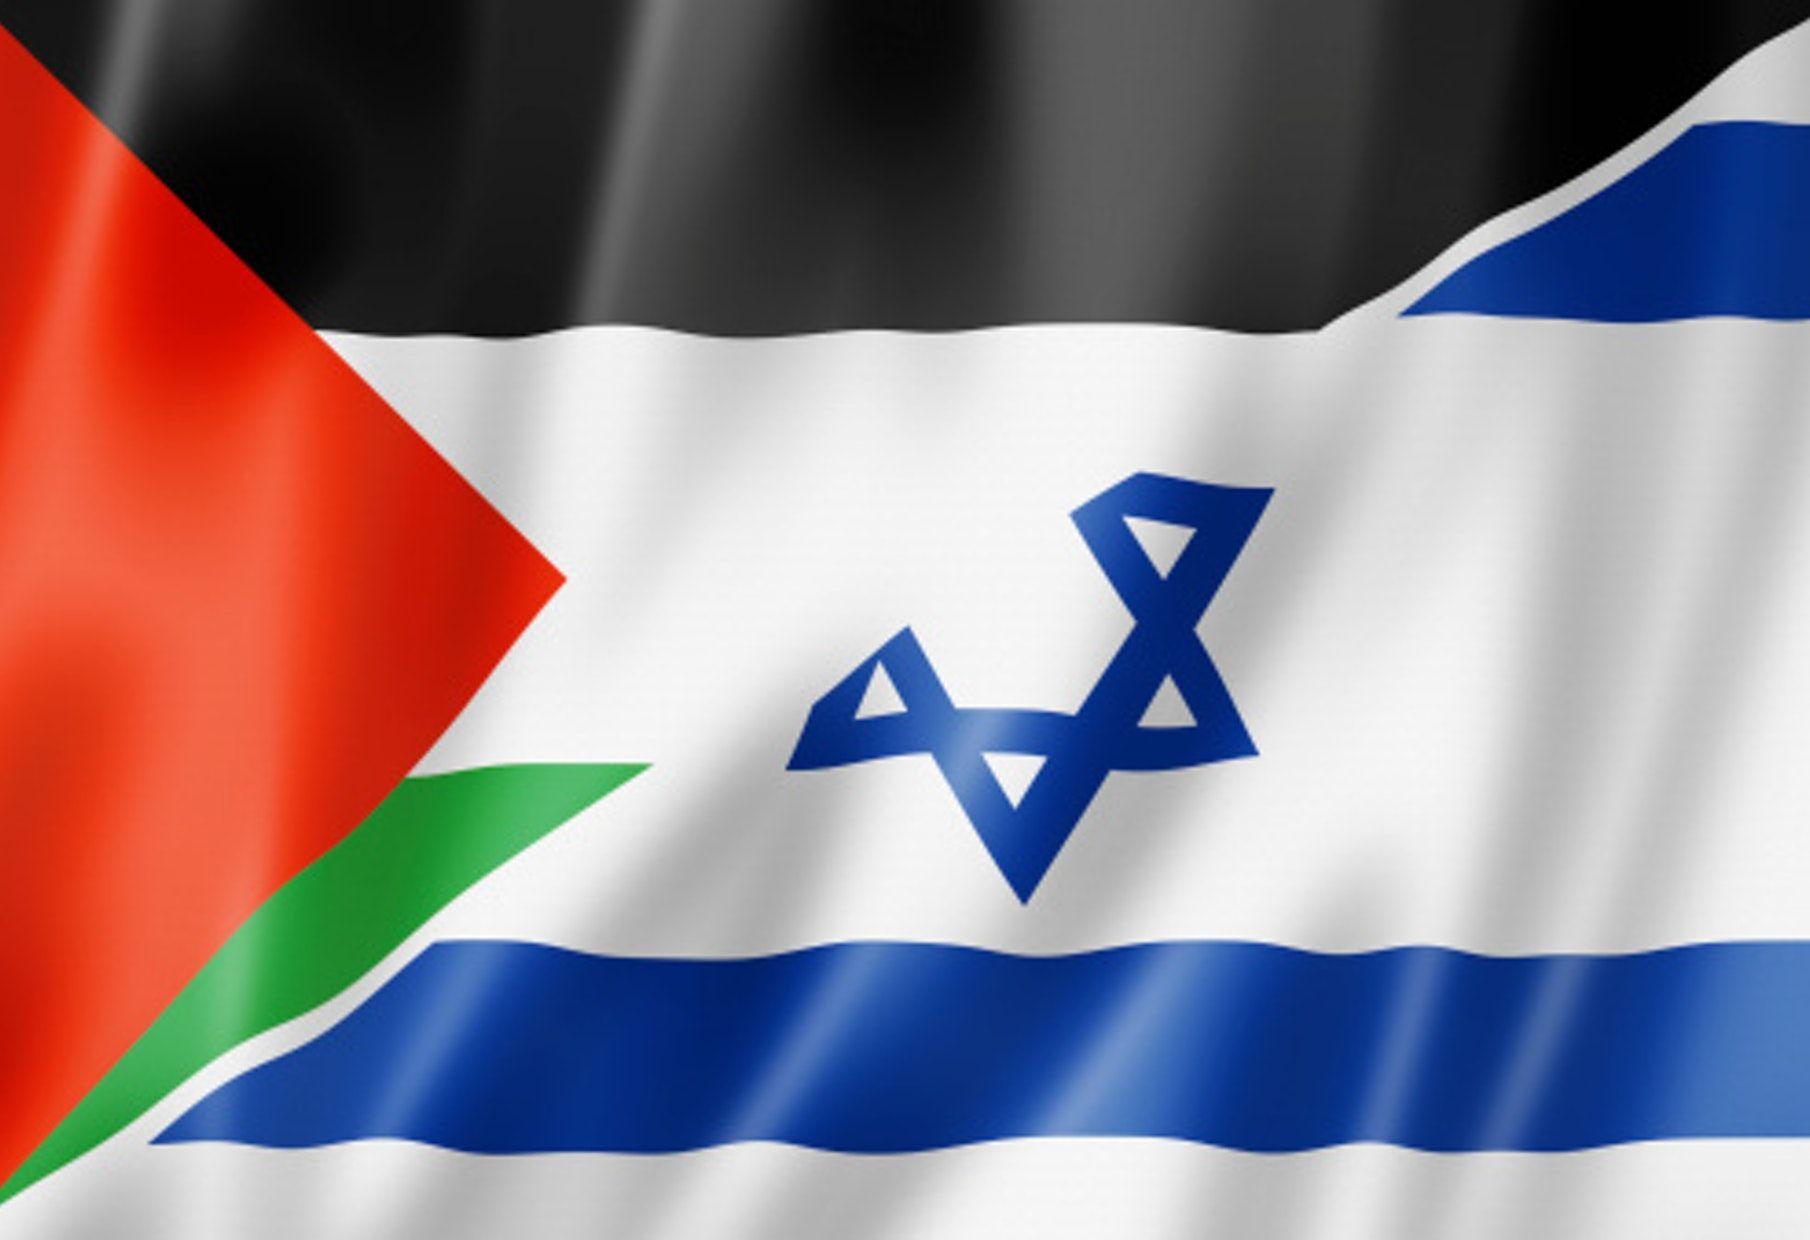 CONFLICT: Israel-Palestine ignites passions around the world